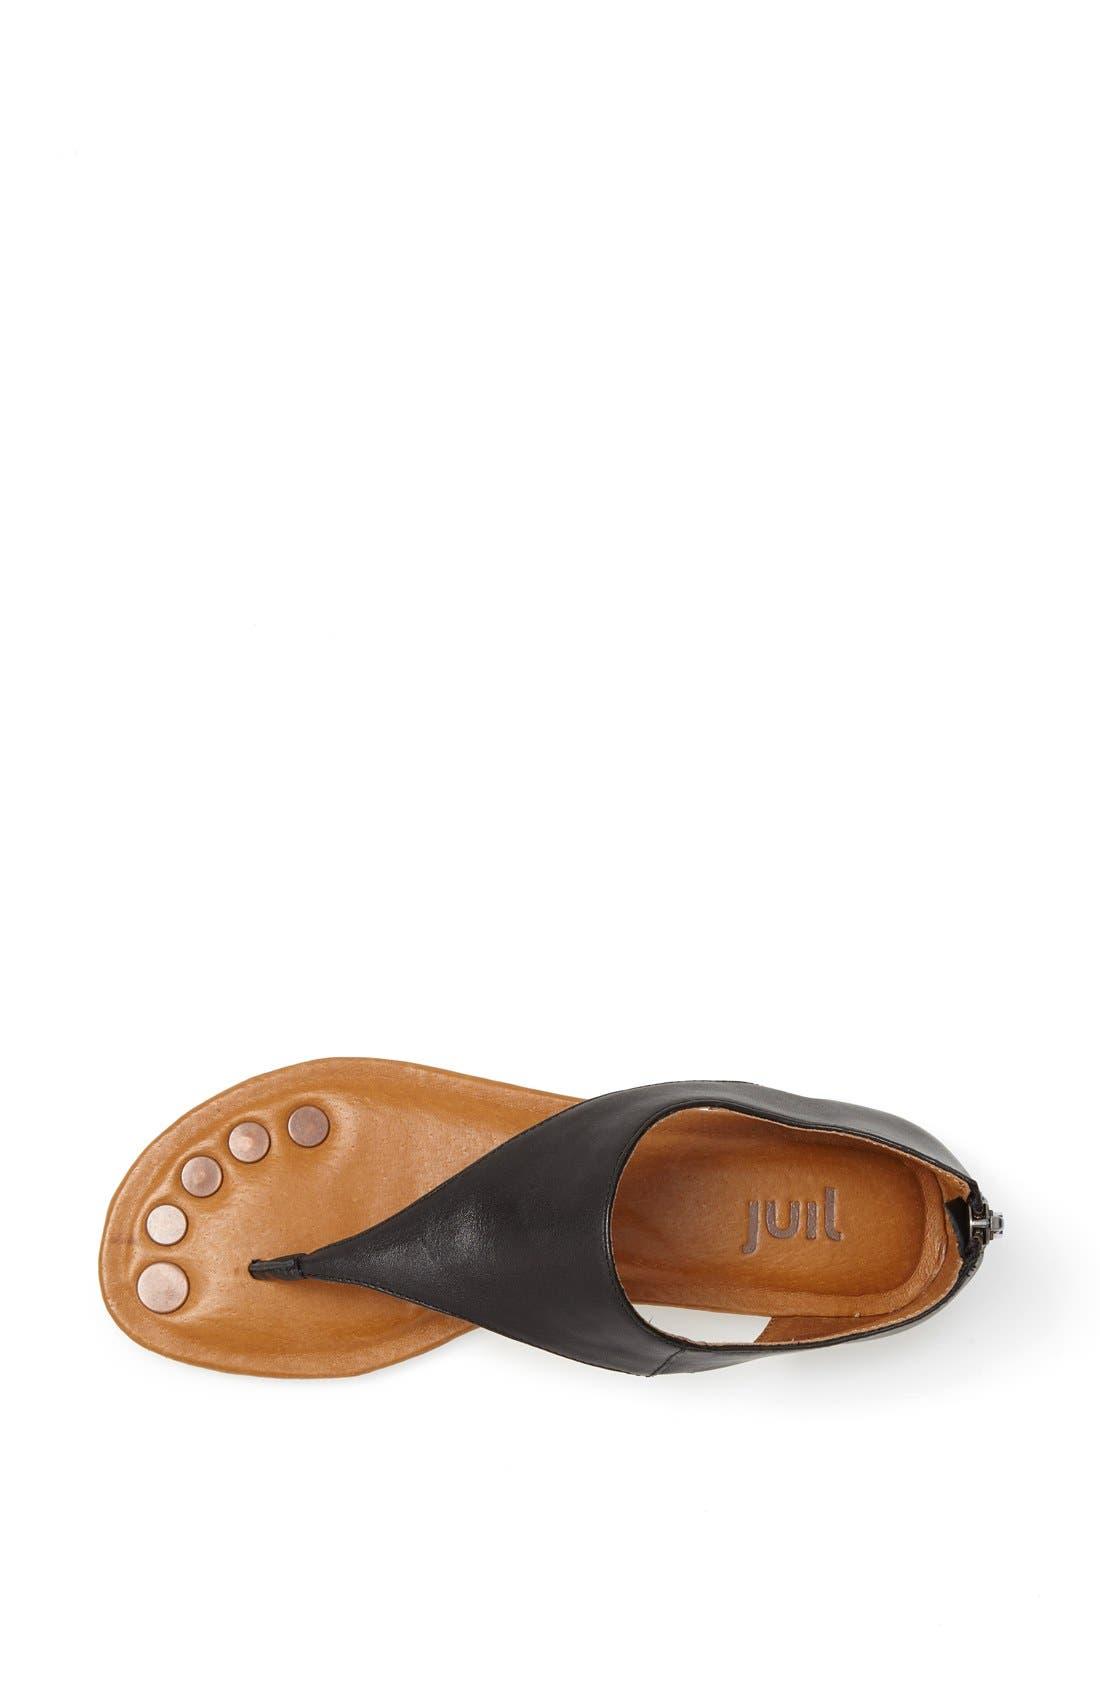 'Luna' Metallic Leather Thong Sandal,                             Alternate thumbnail 4, color,                             010